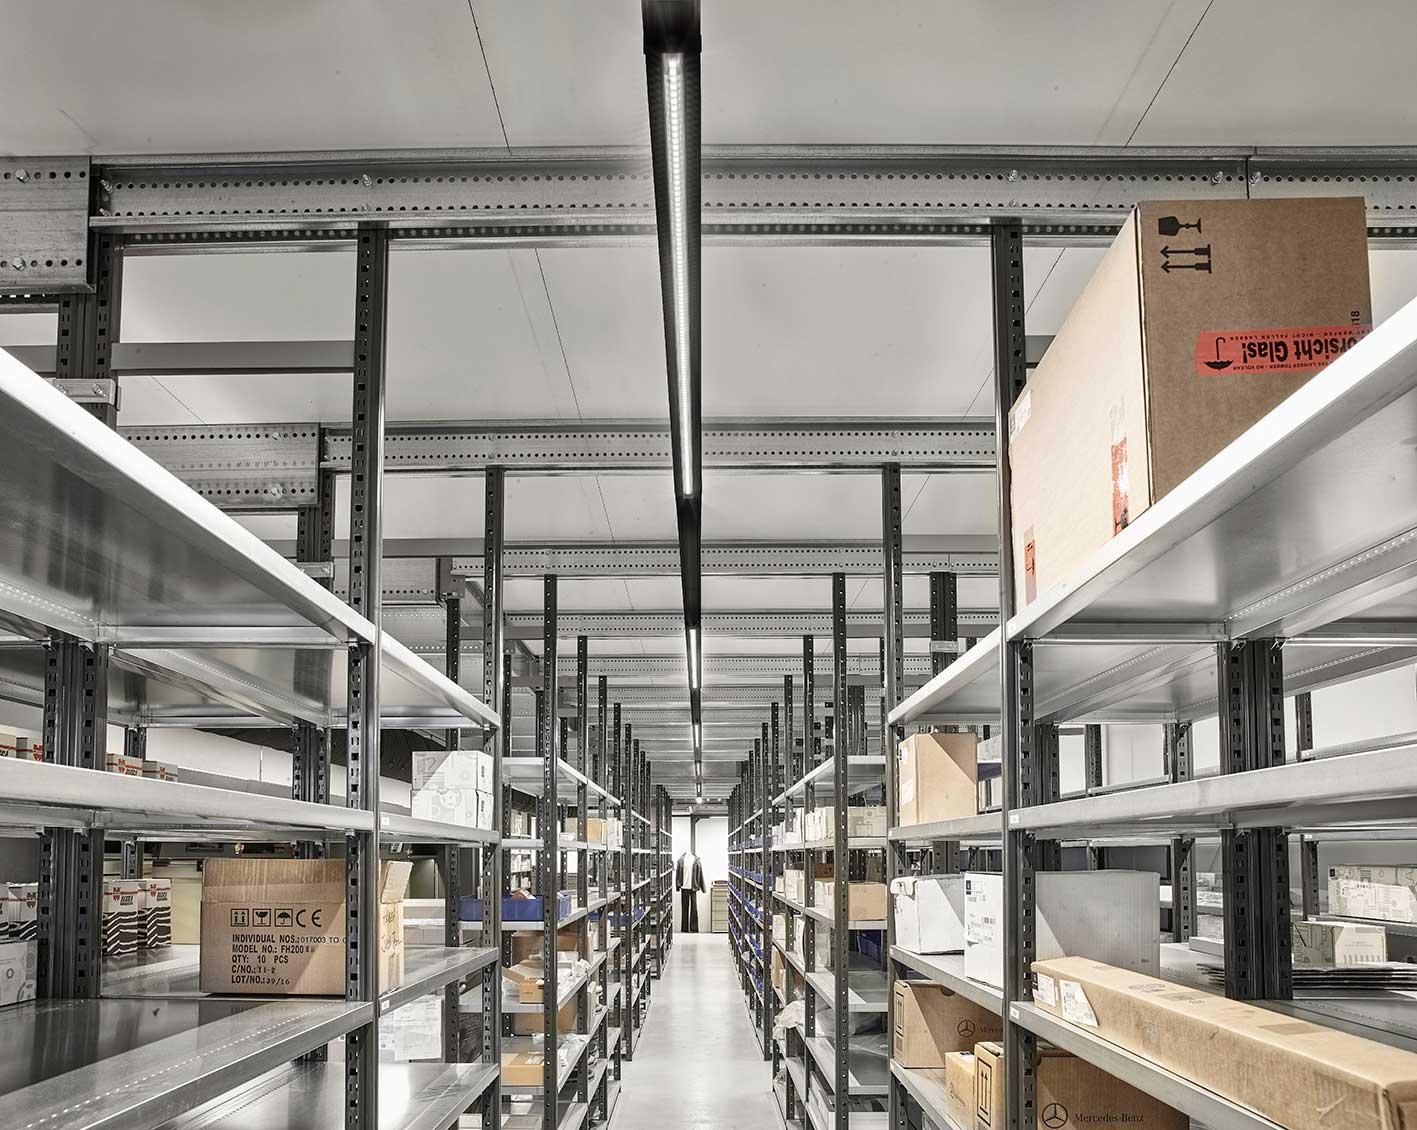 Linia monteret i skinnesystem på depotrum - Luminex